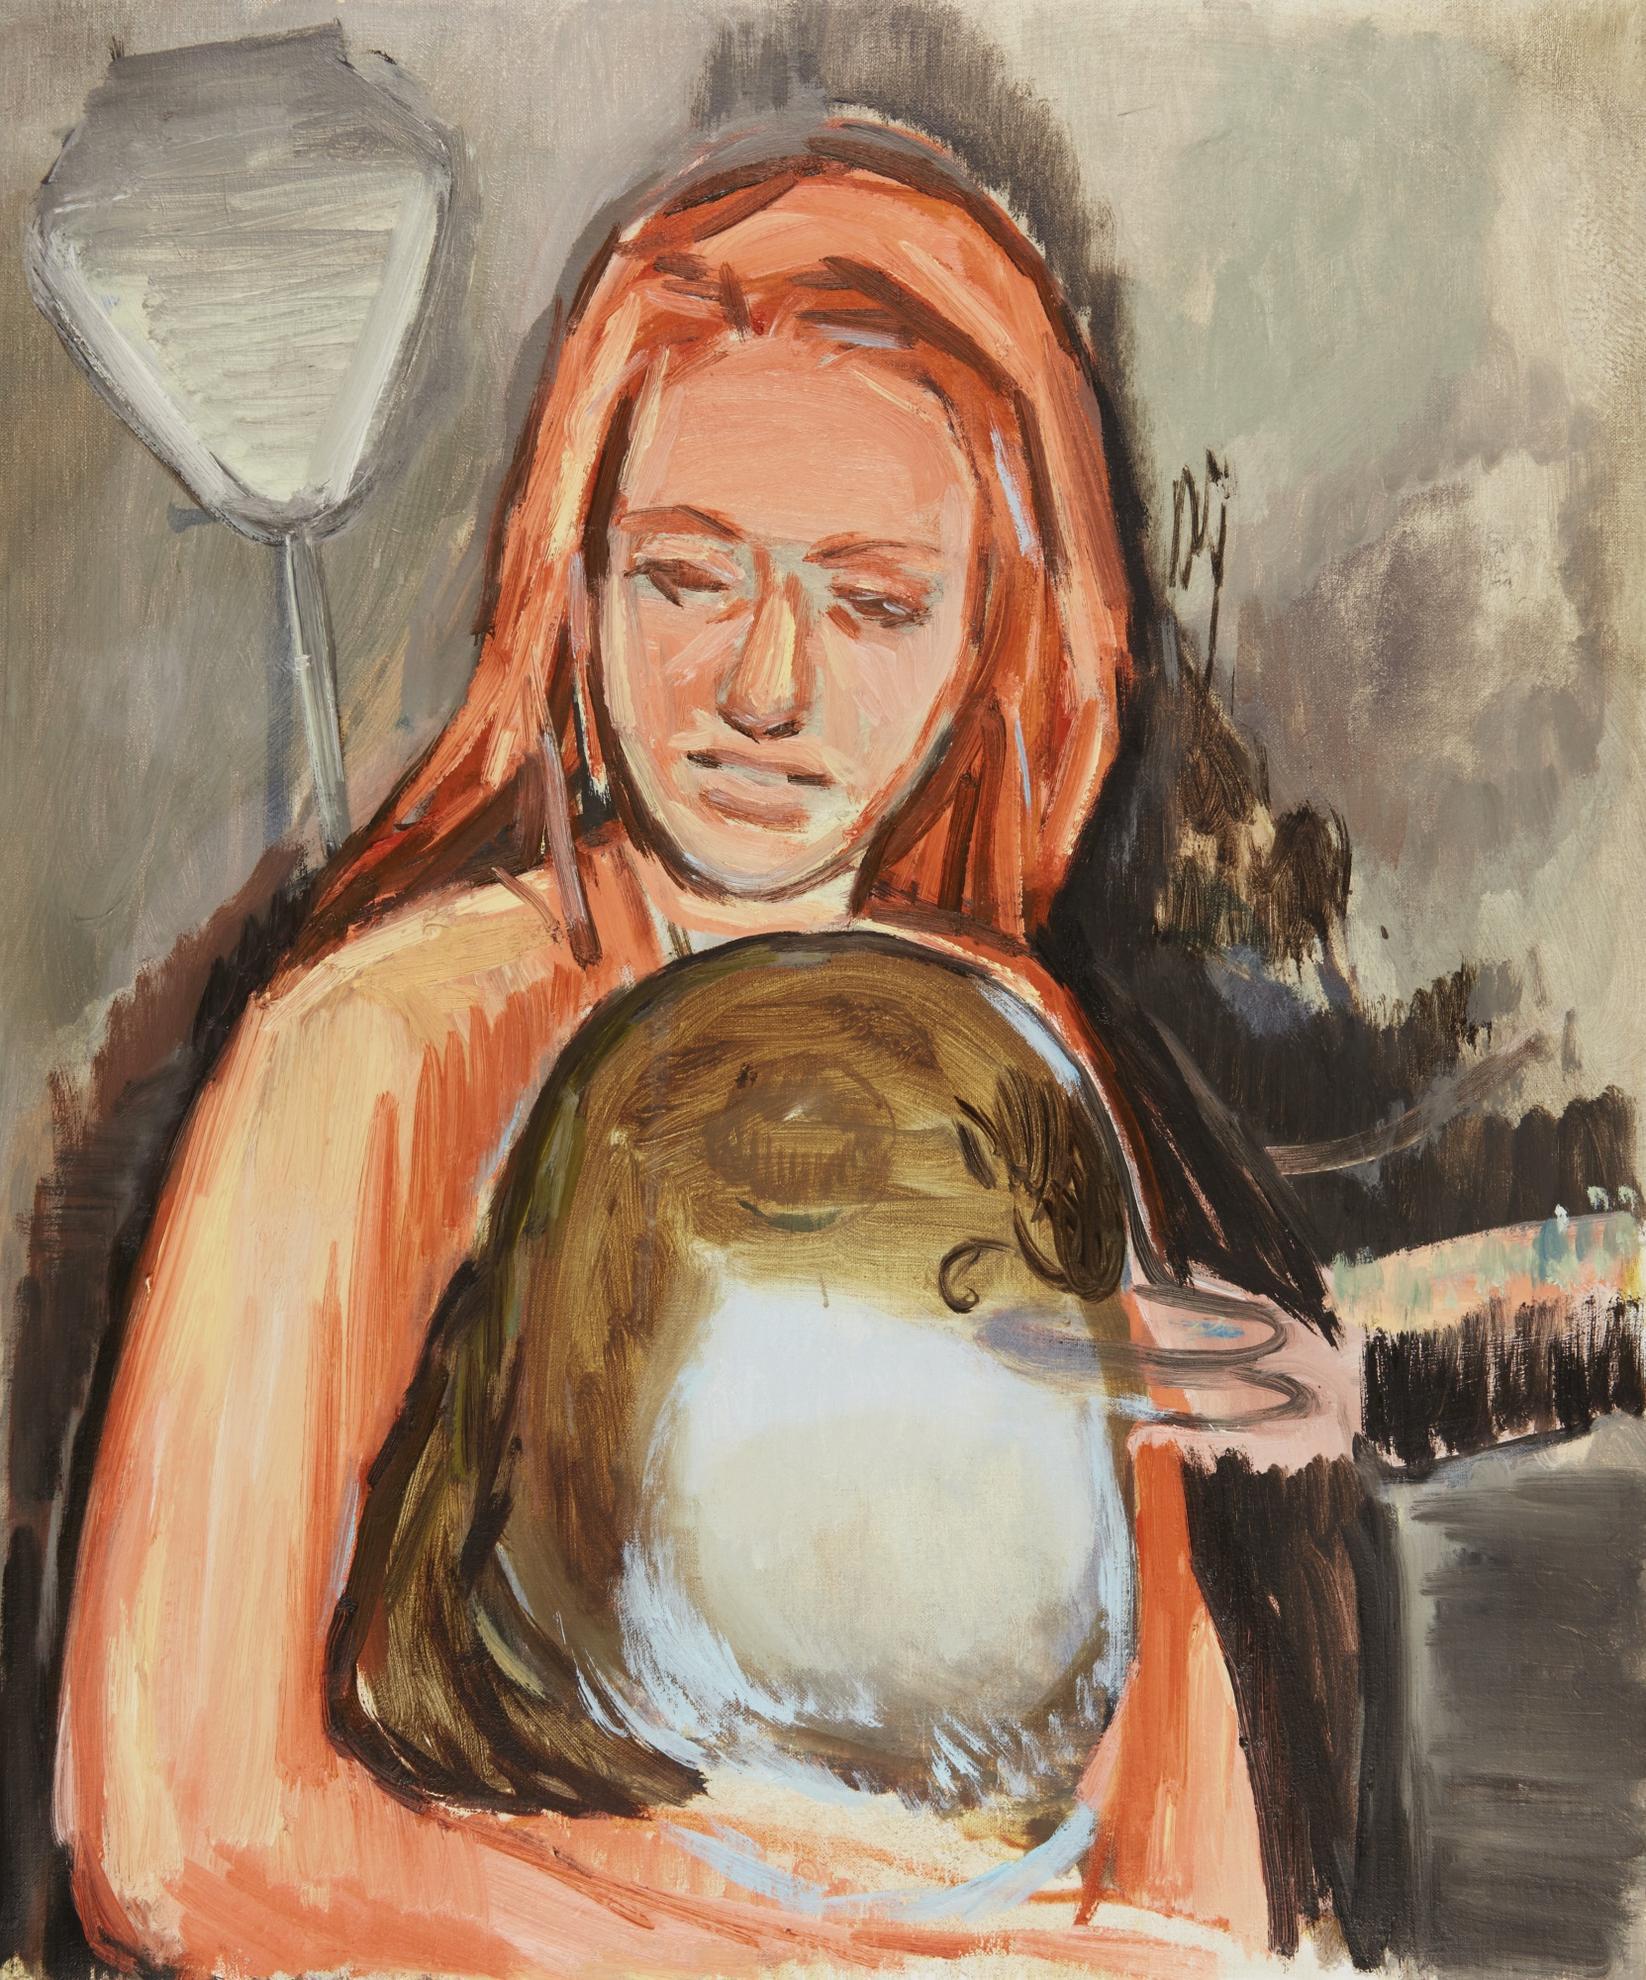 Neal Tait-Orange Girl-2003